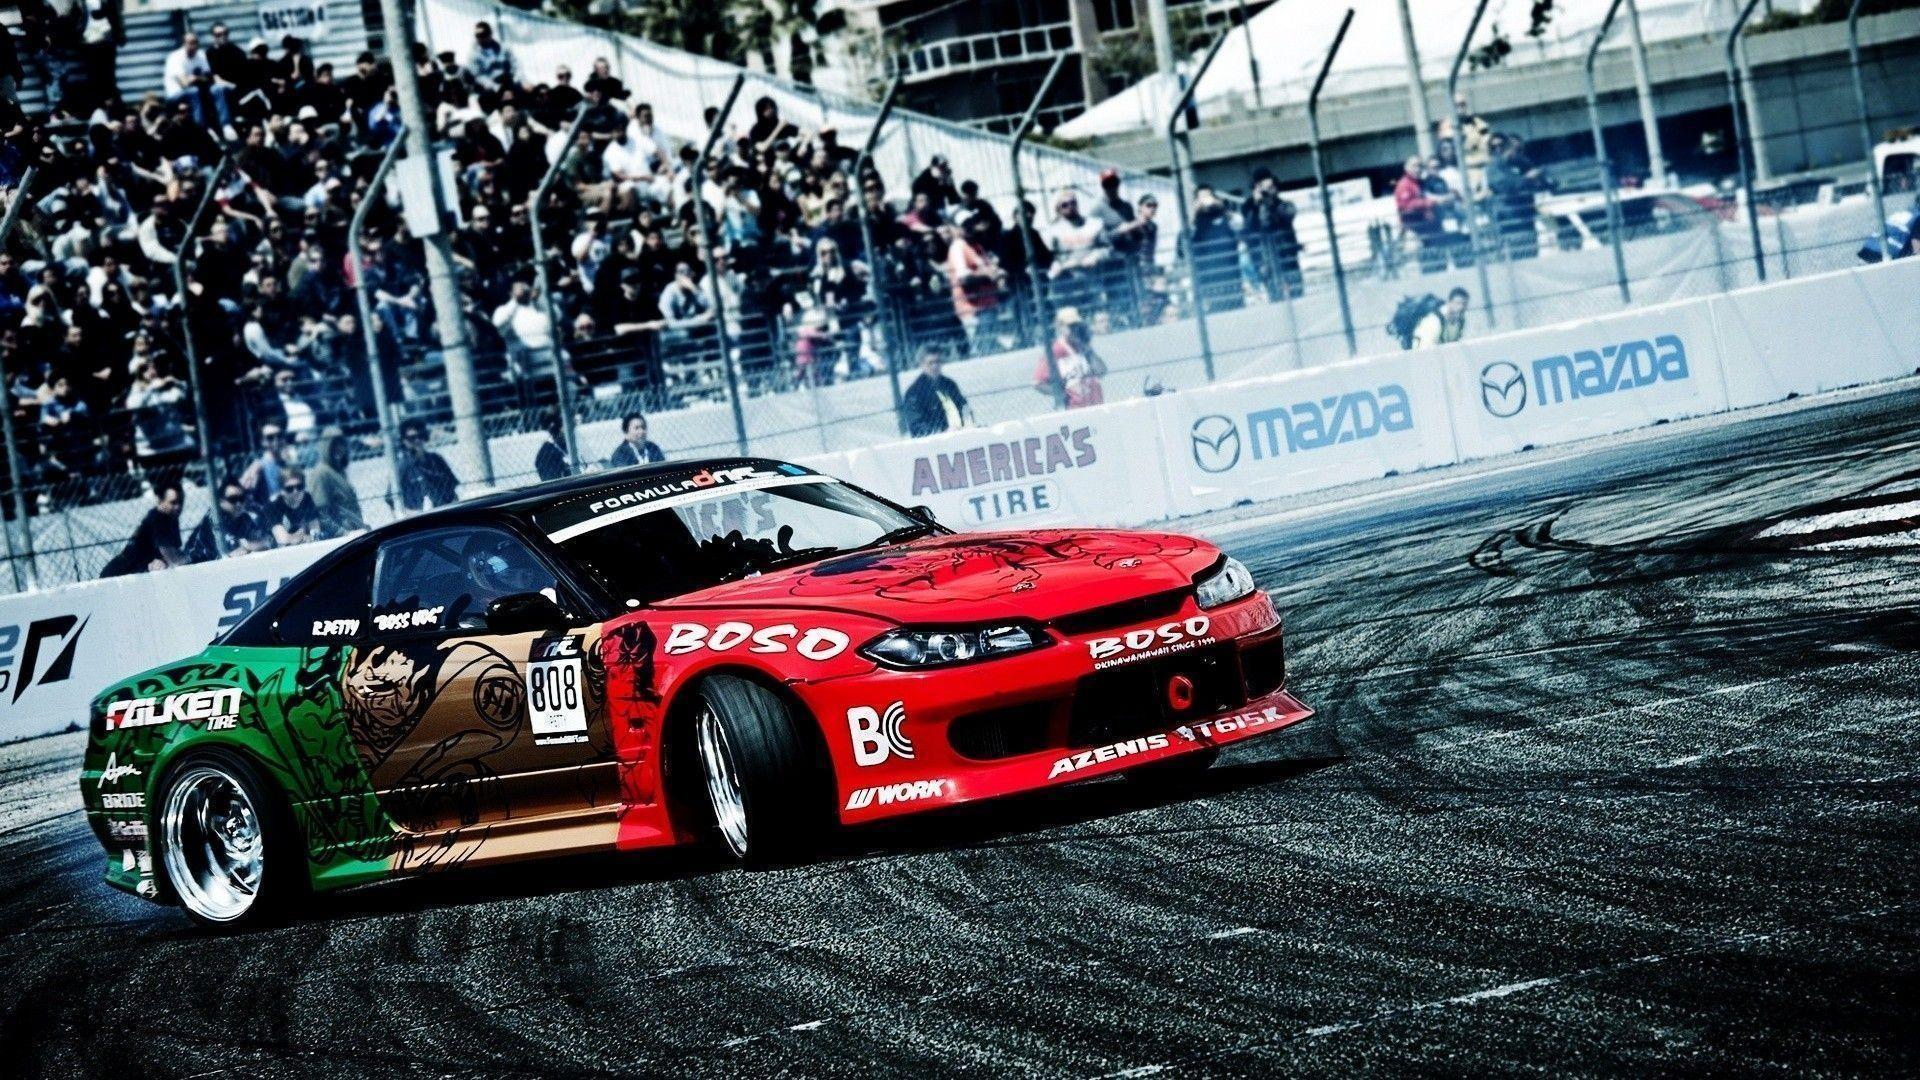 Toyota Supra Car Racing Drift Night Wallpapers - Wallpaper ...